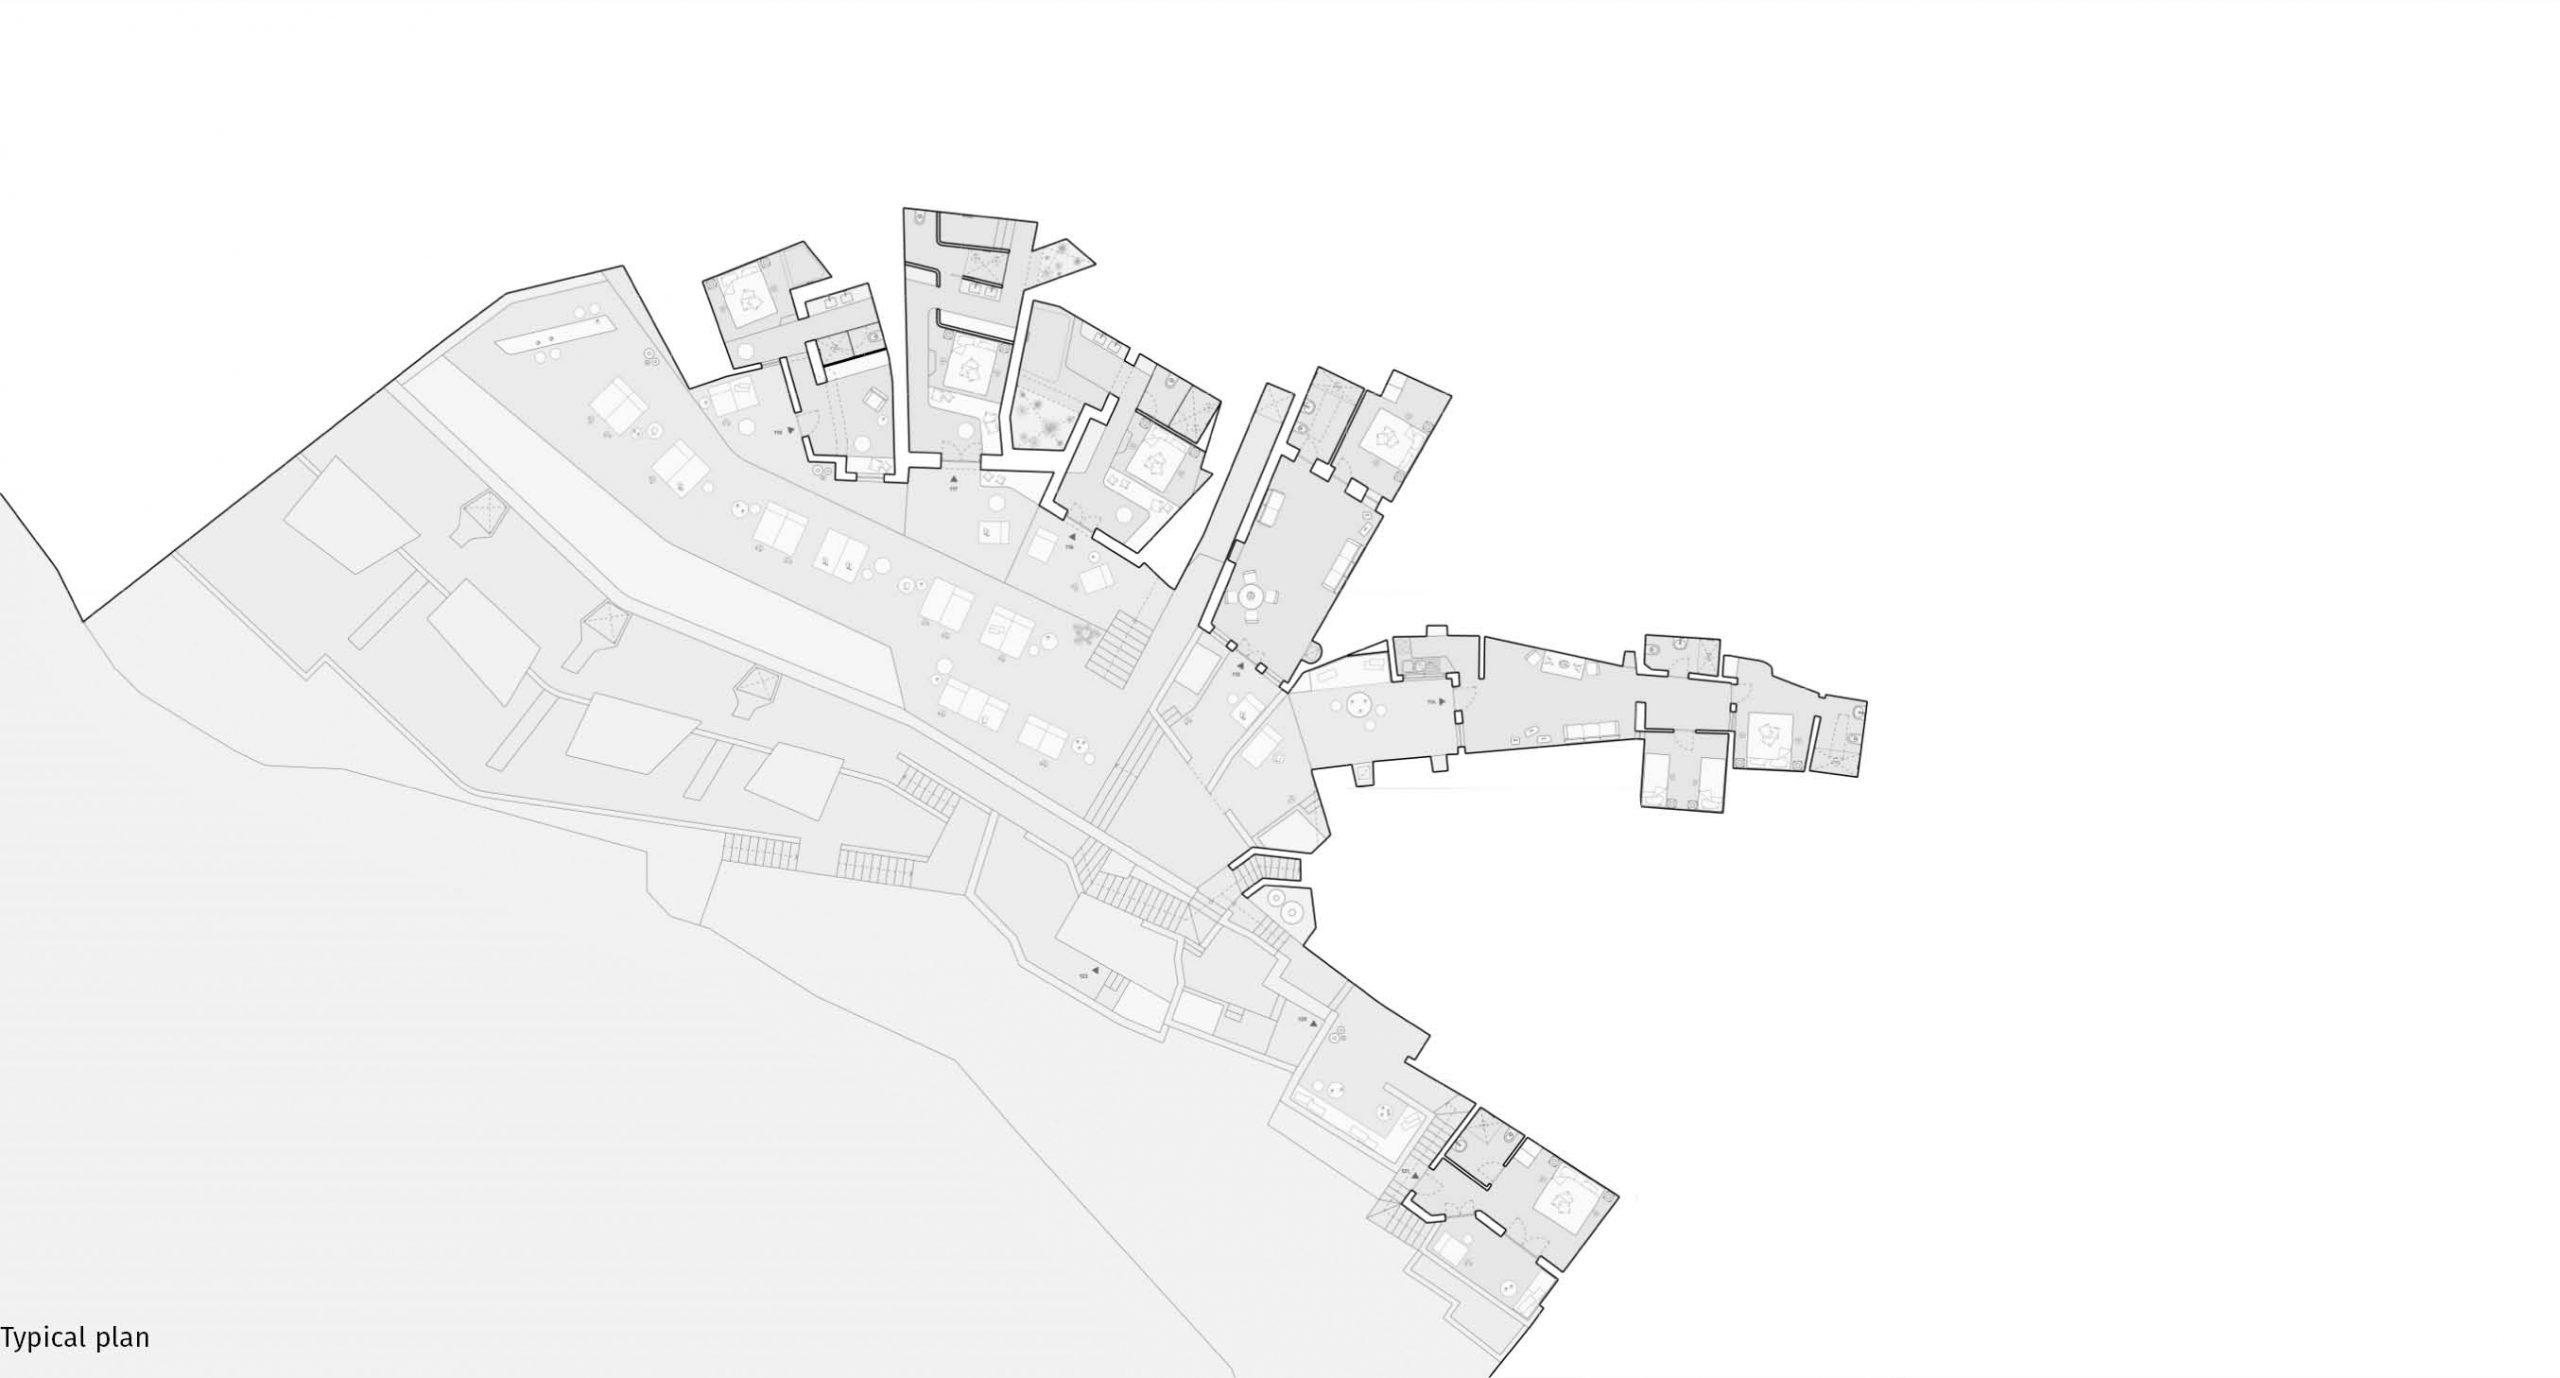 Spacegram_DegreeZeroArchitects_Santorini_White_Arc_Cyclodian_Grece_Pool_Island08